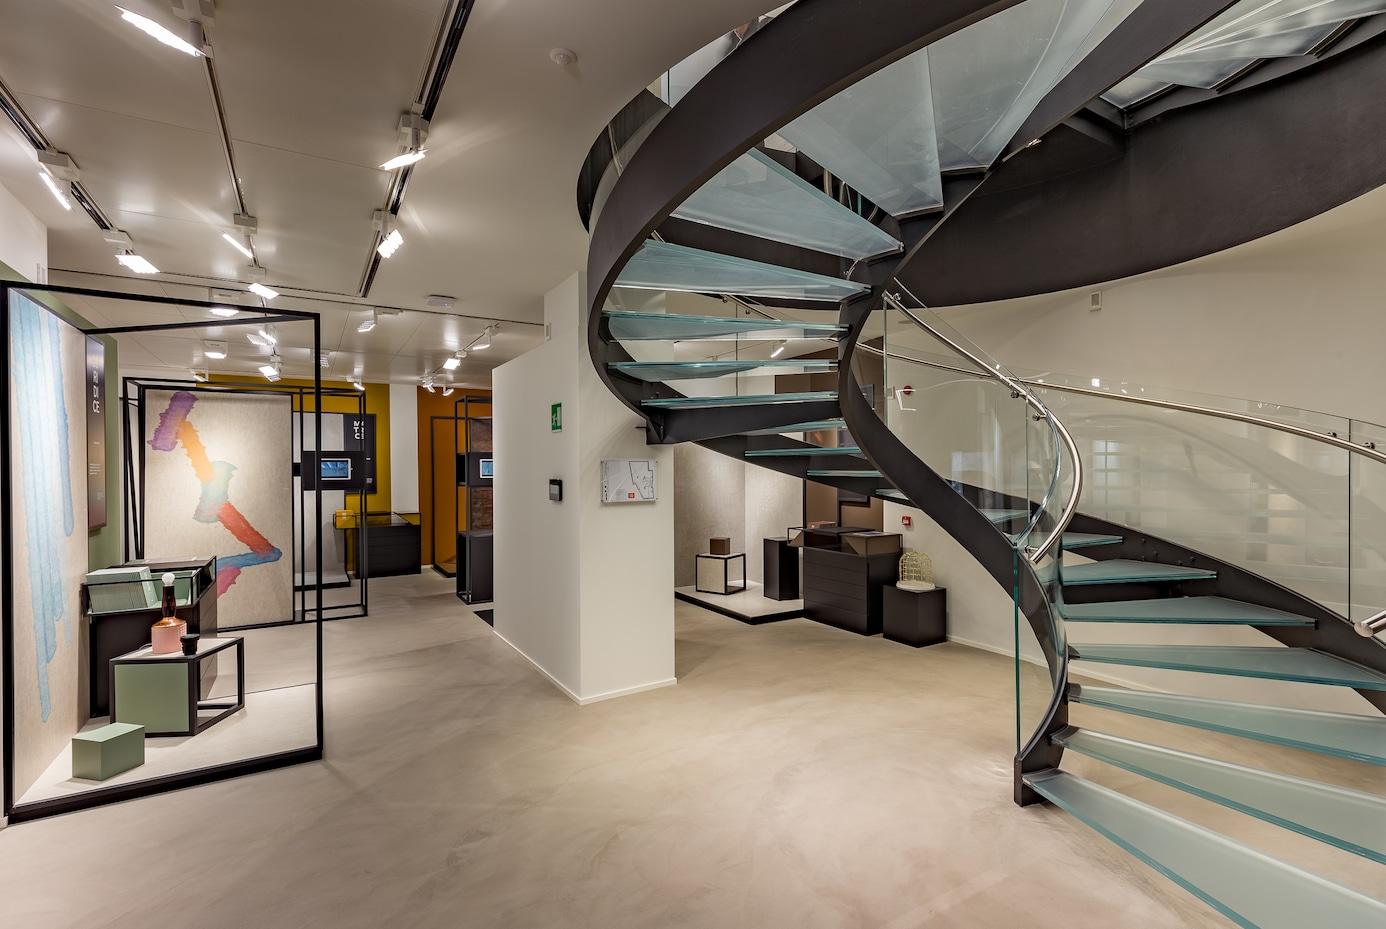 Cedit – Ceramiche d'Italia in Milan